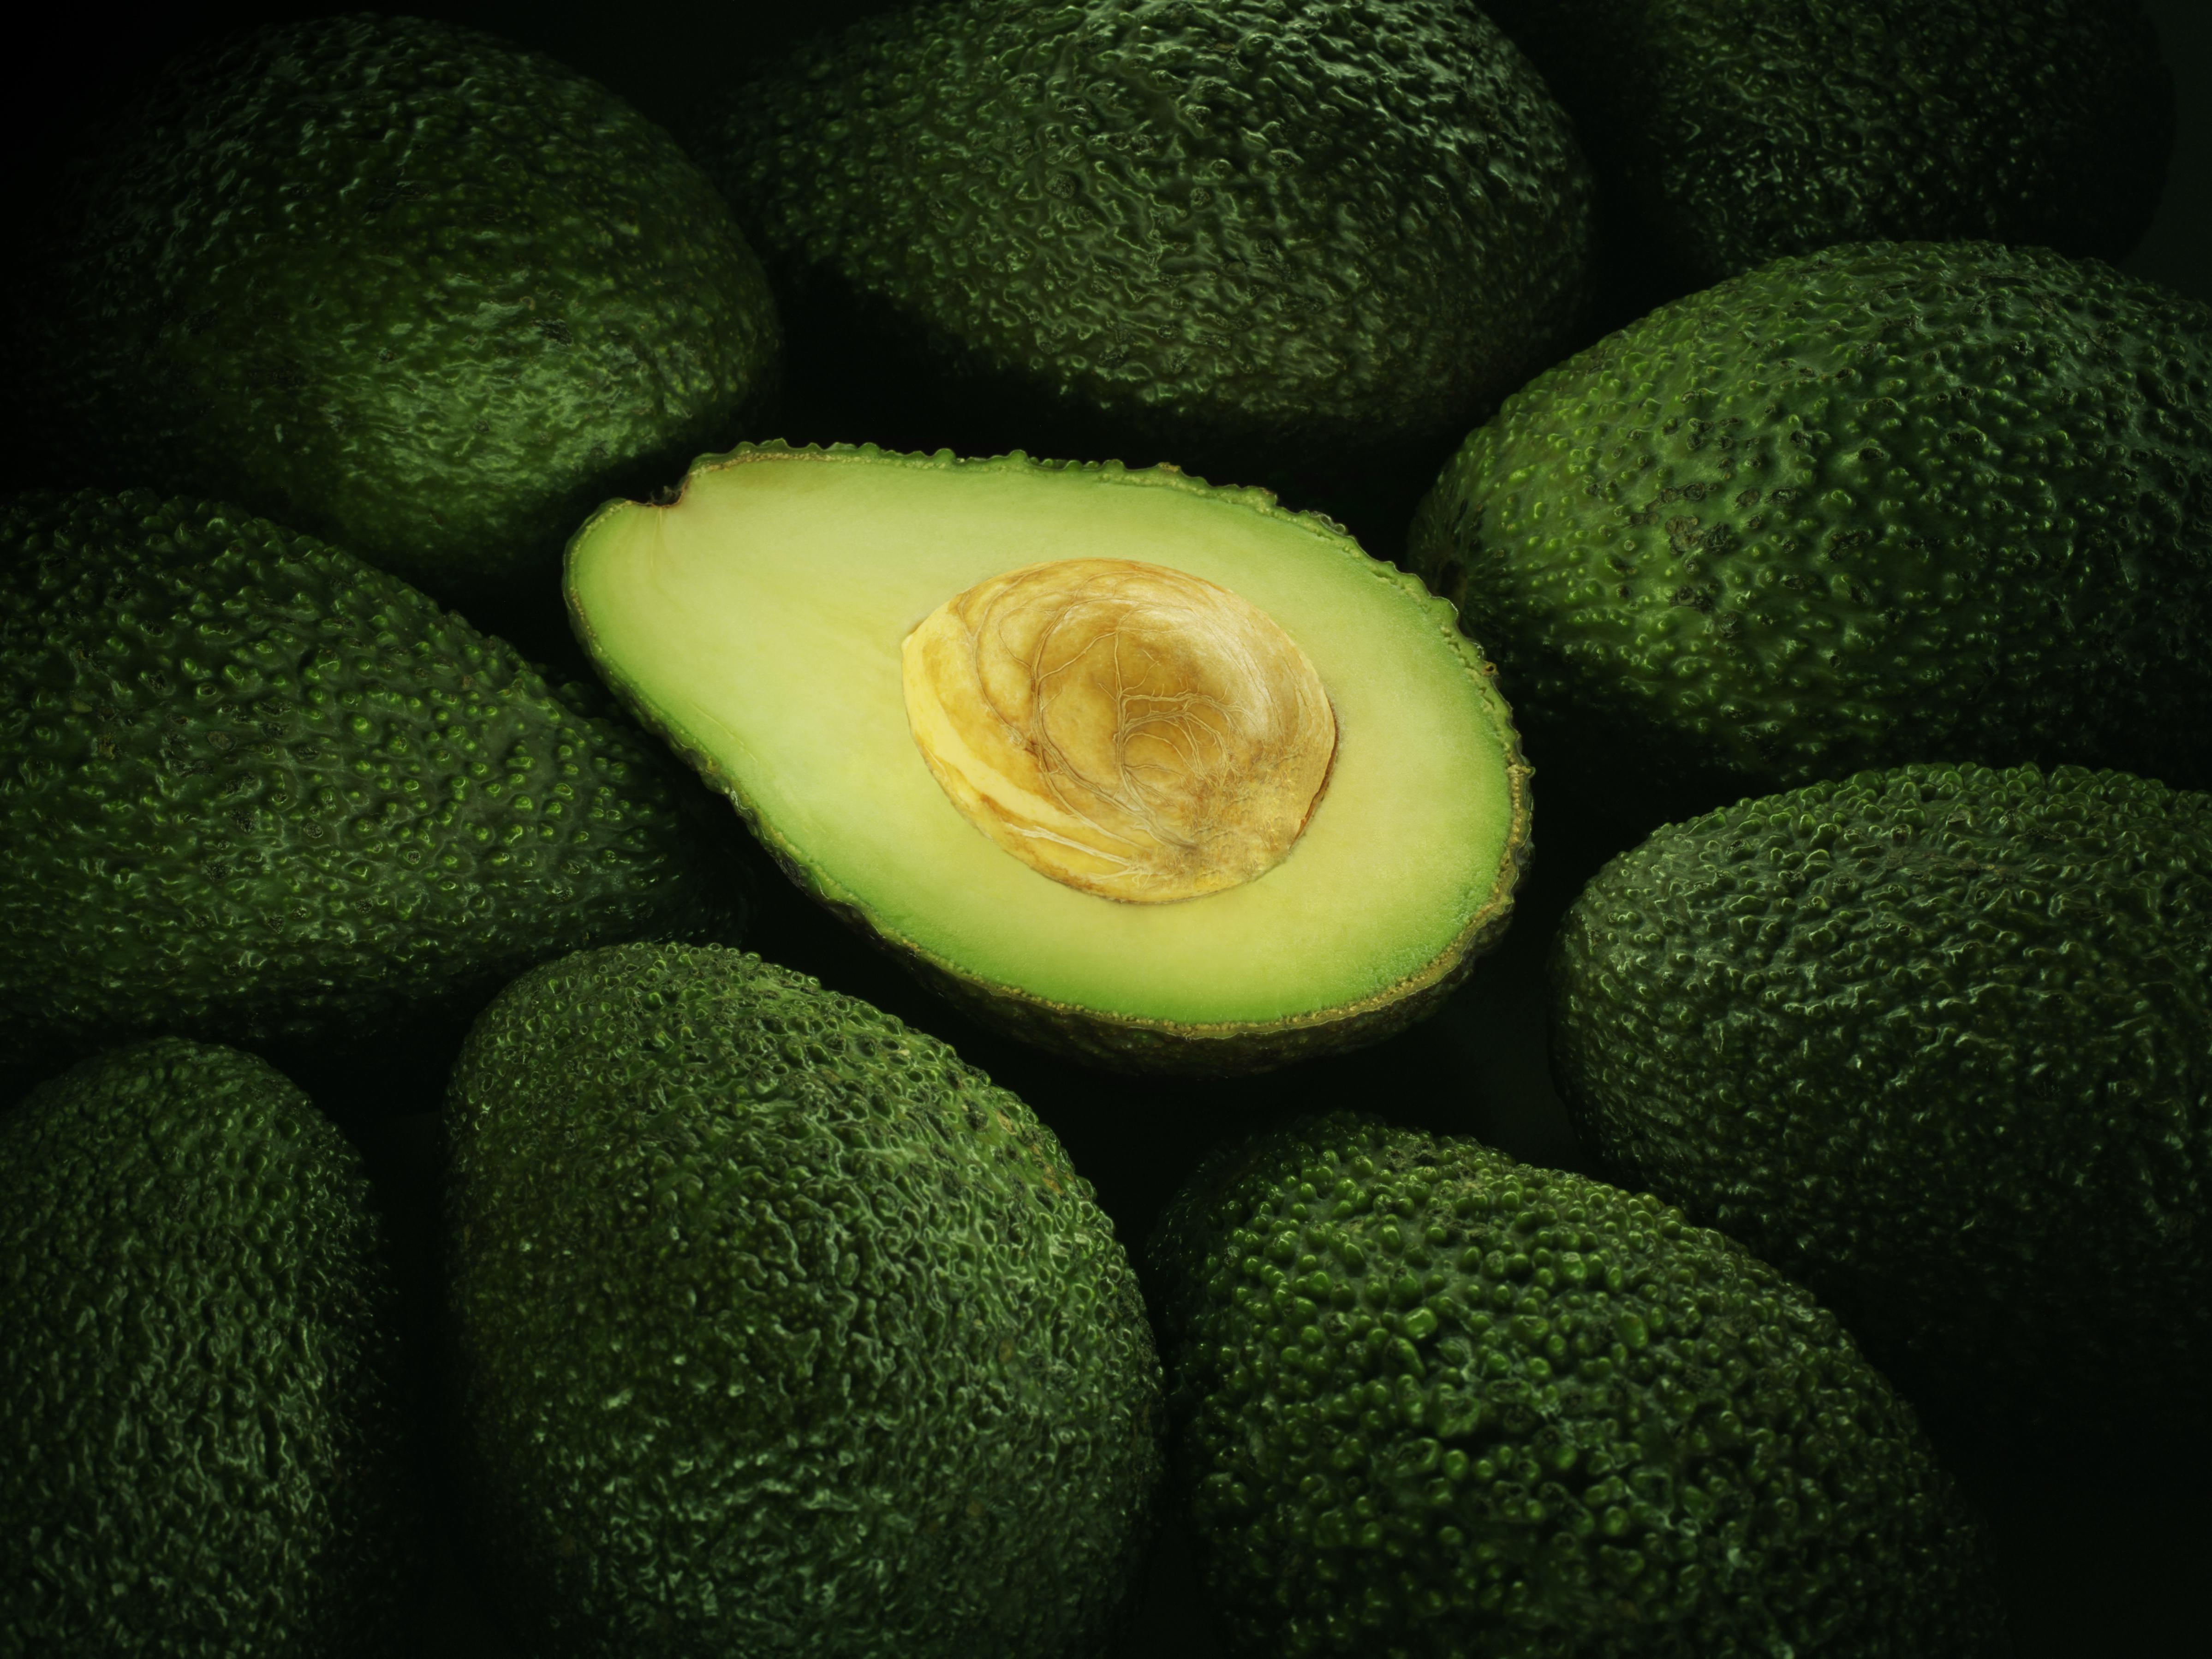 Cross section of ripe avocado